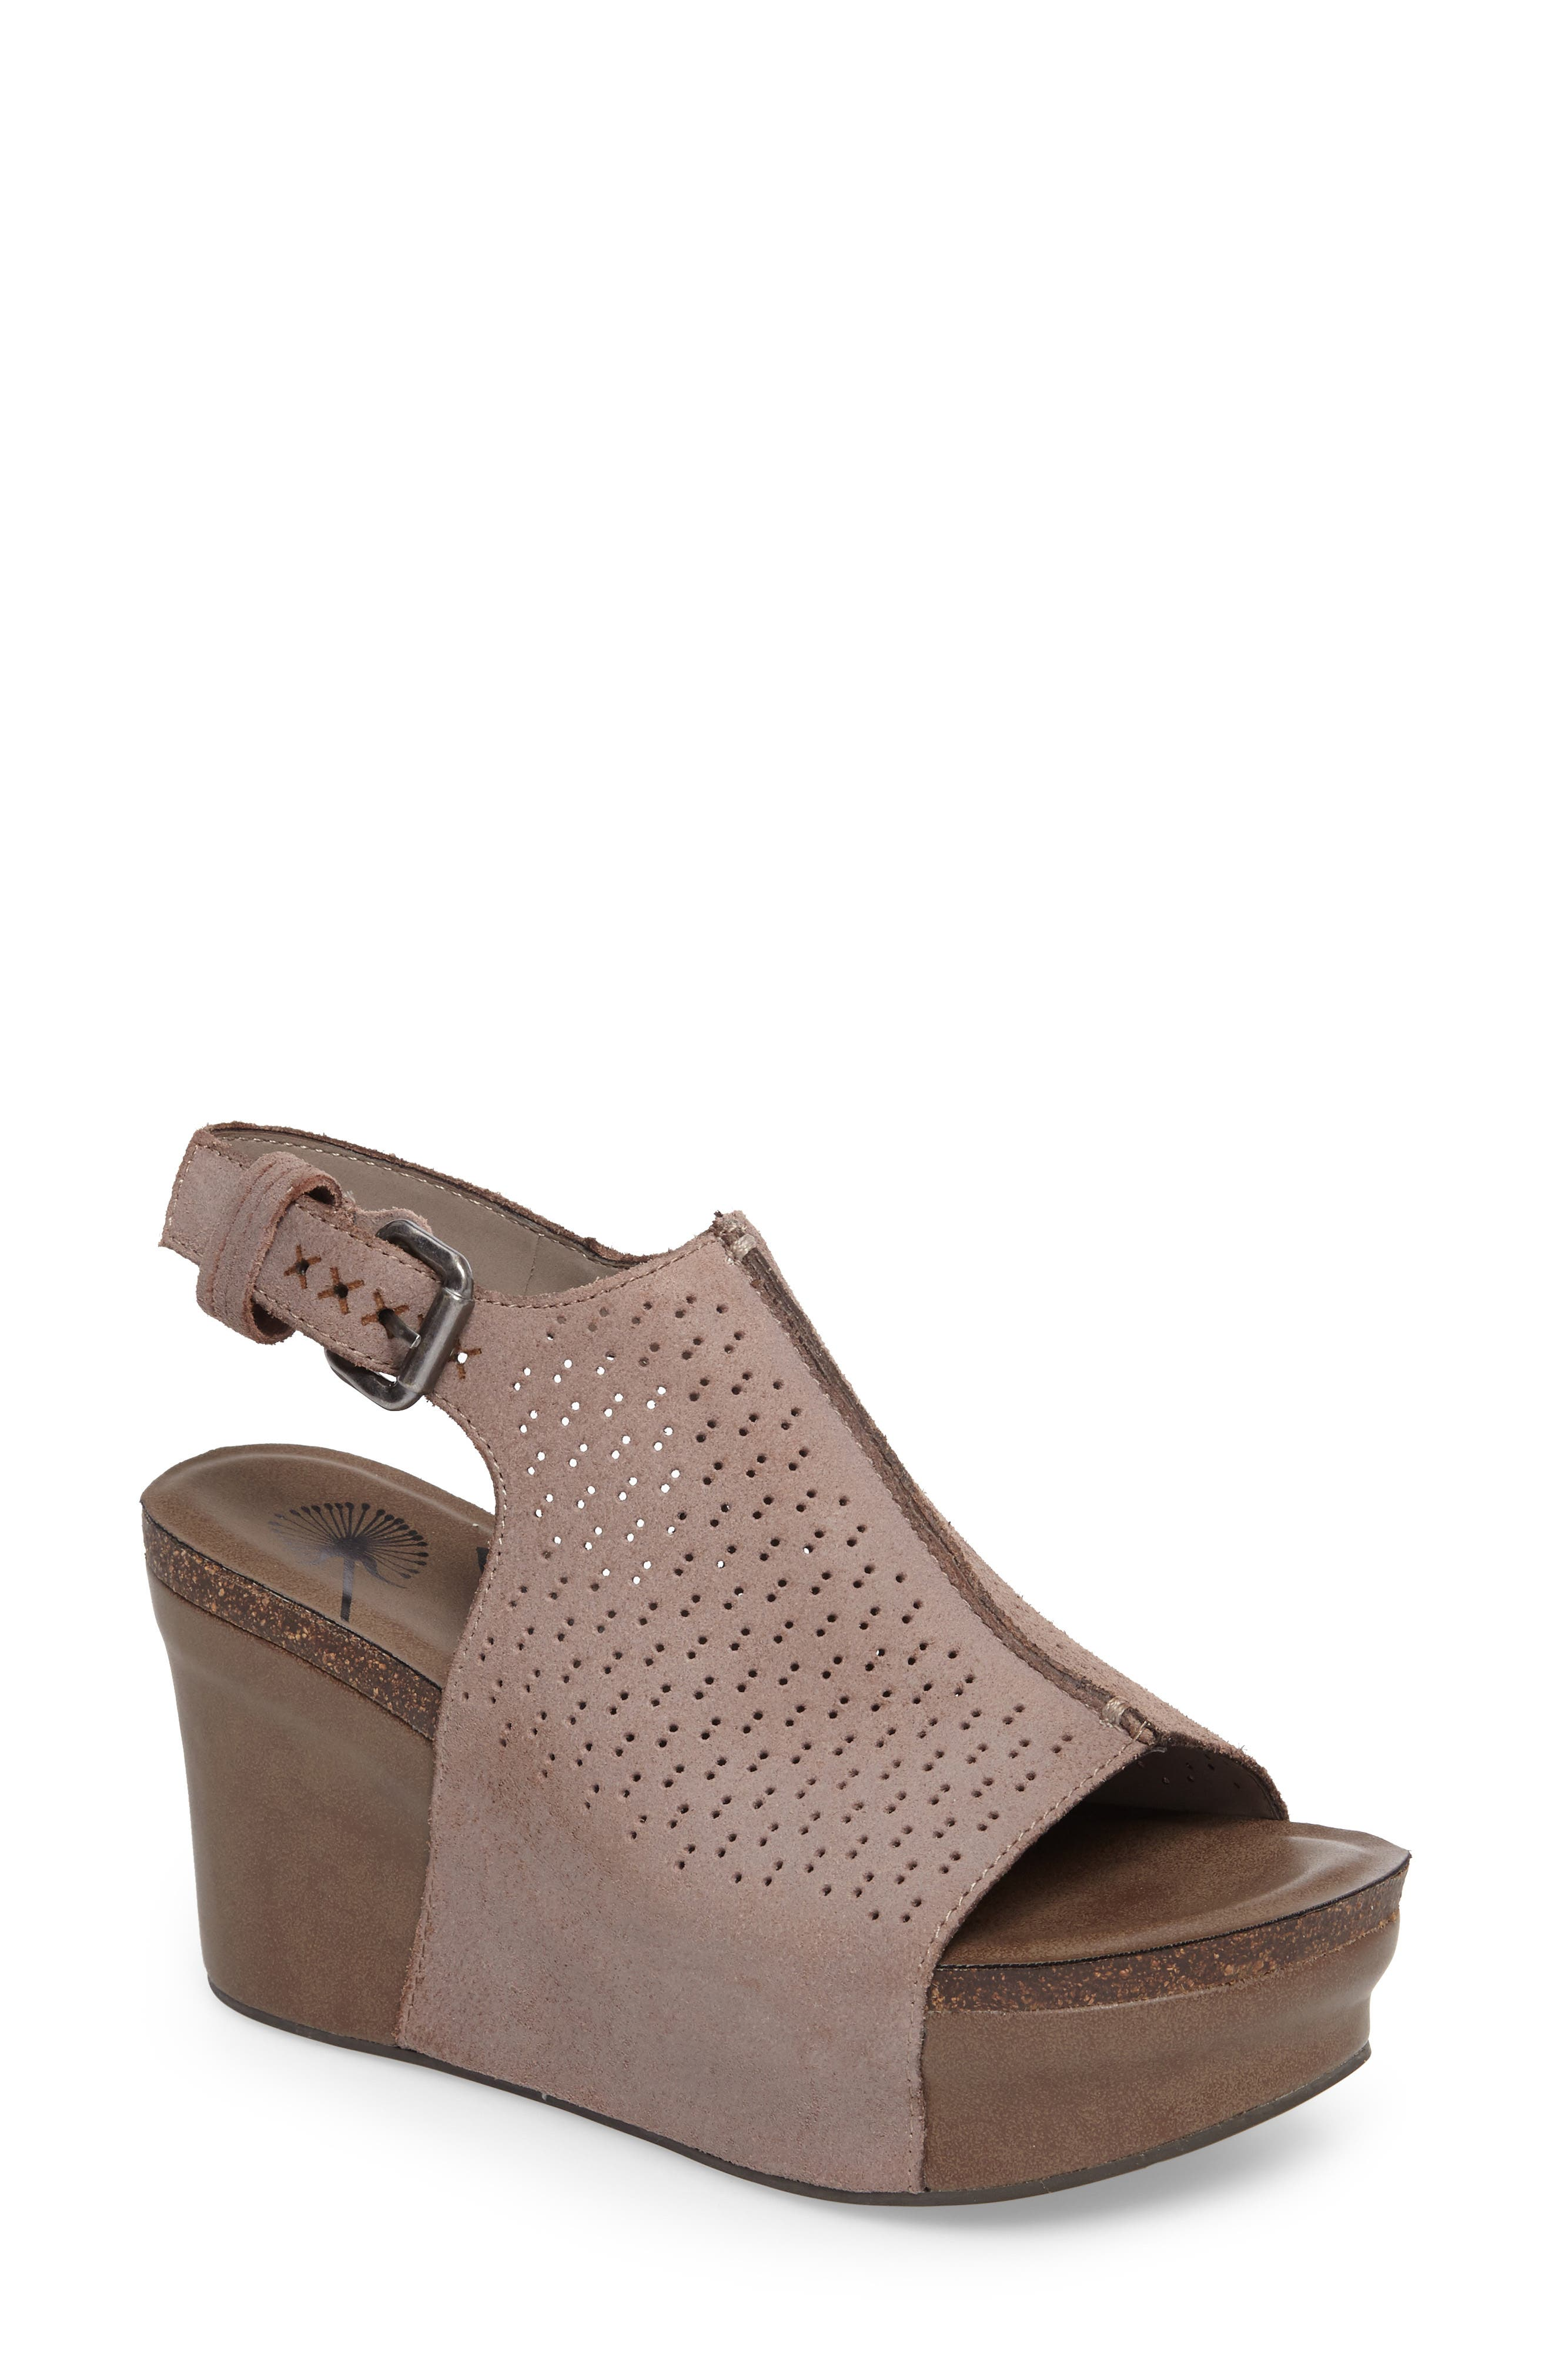 Main Image - OTBT Jaunt Platform Wedge Sandal (Women)